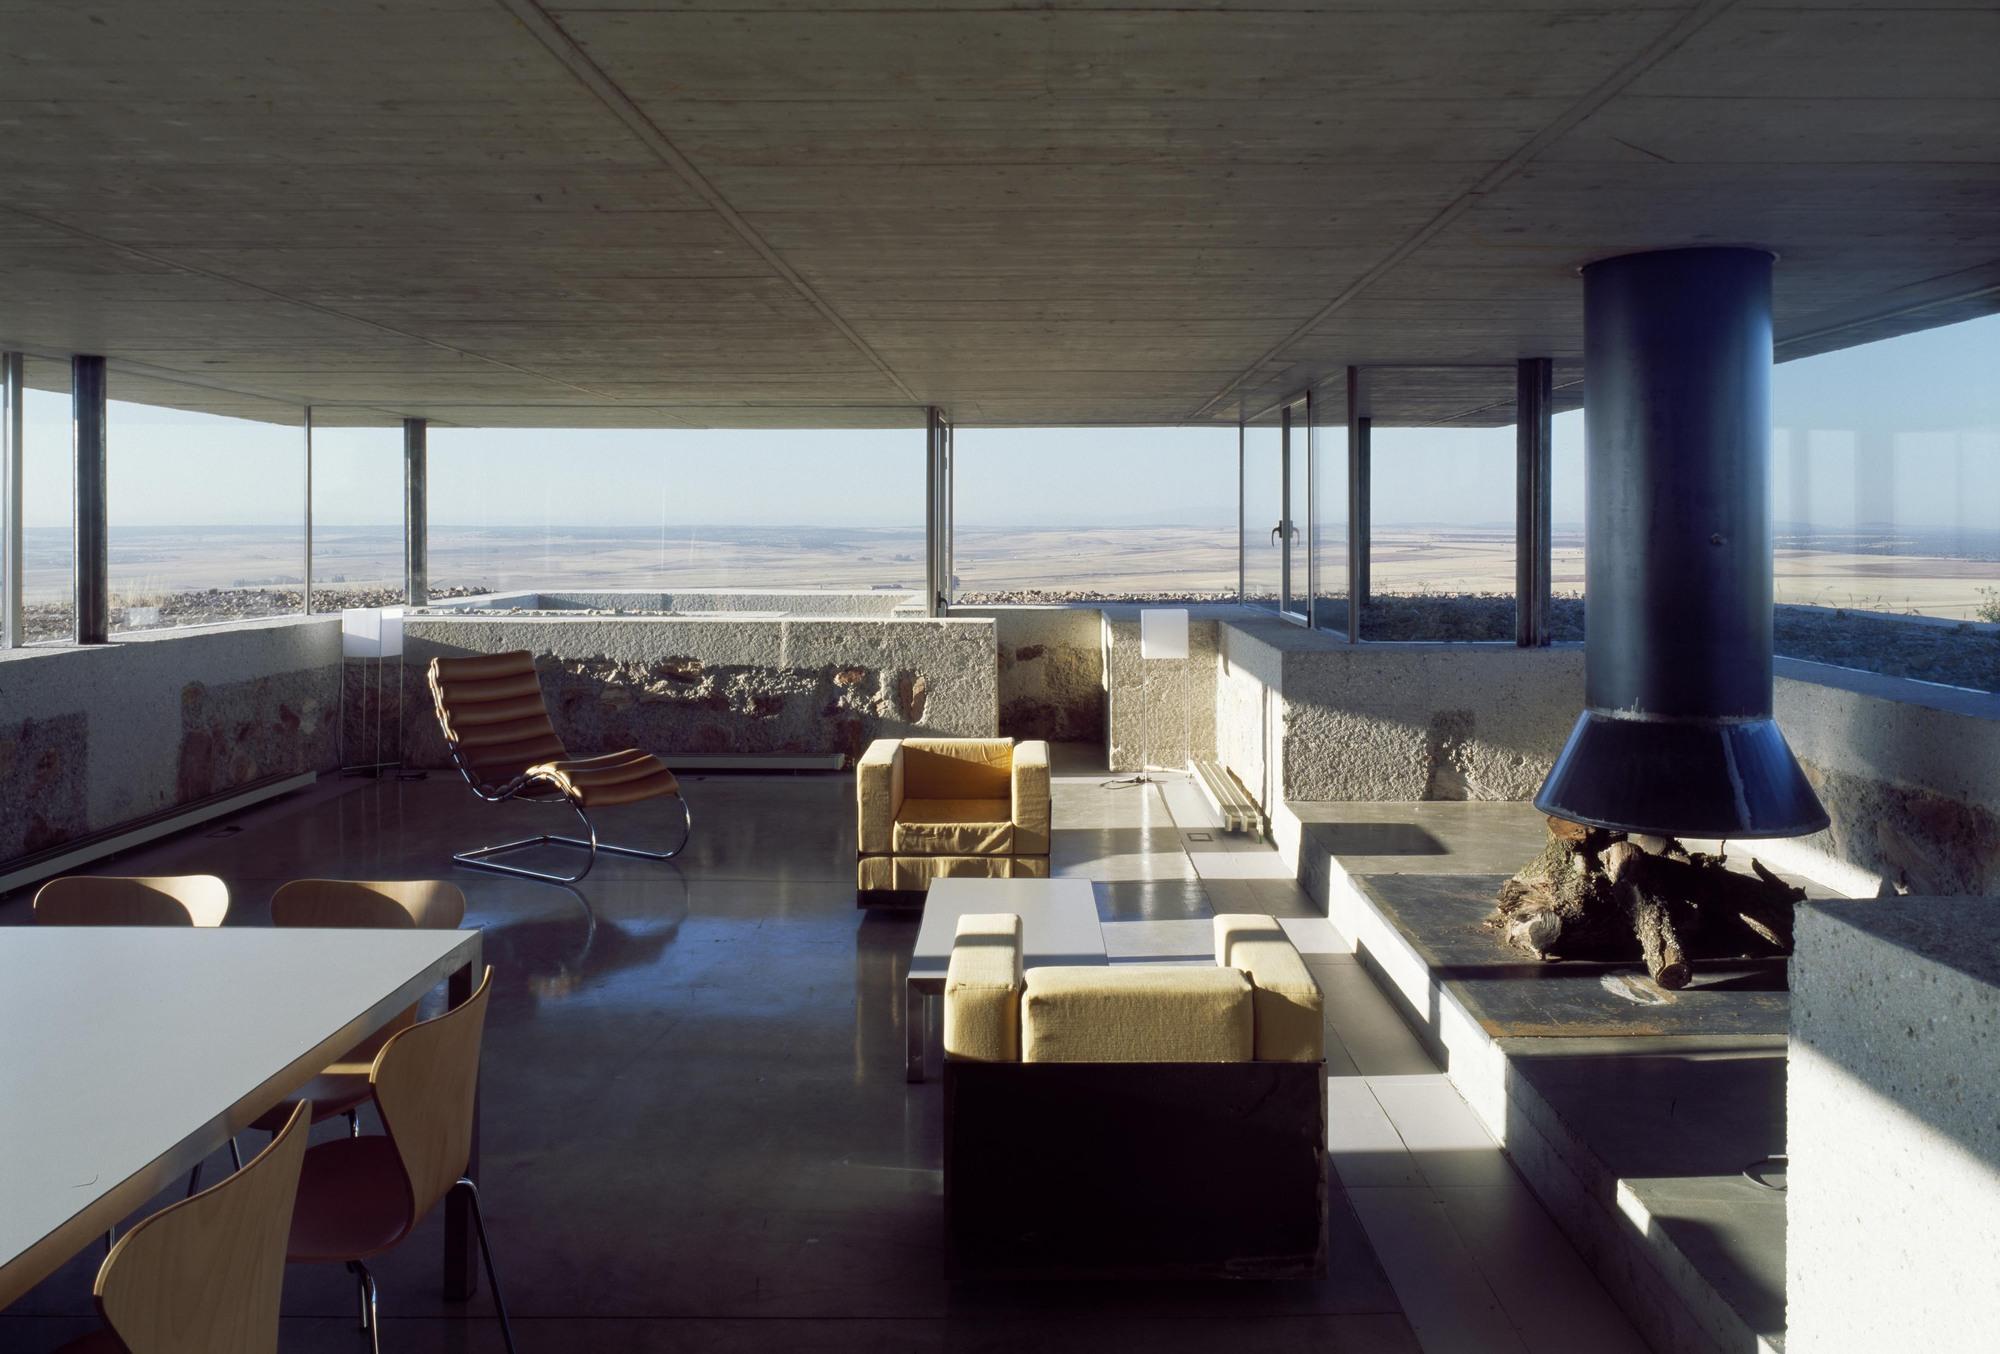 Casa do Horizonte / Jesús Aparicio Estudio de Arquitectura, © Roland Halbe